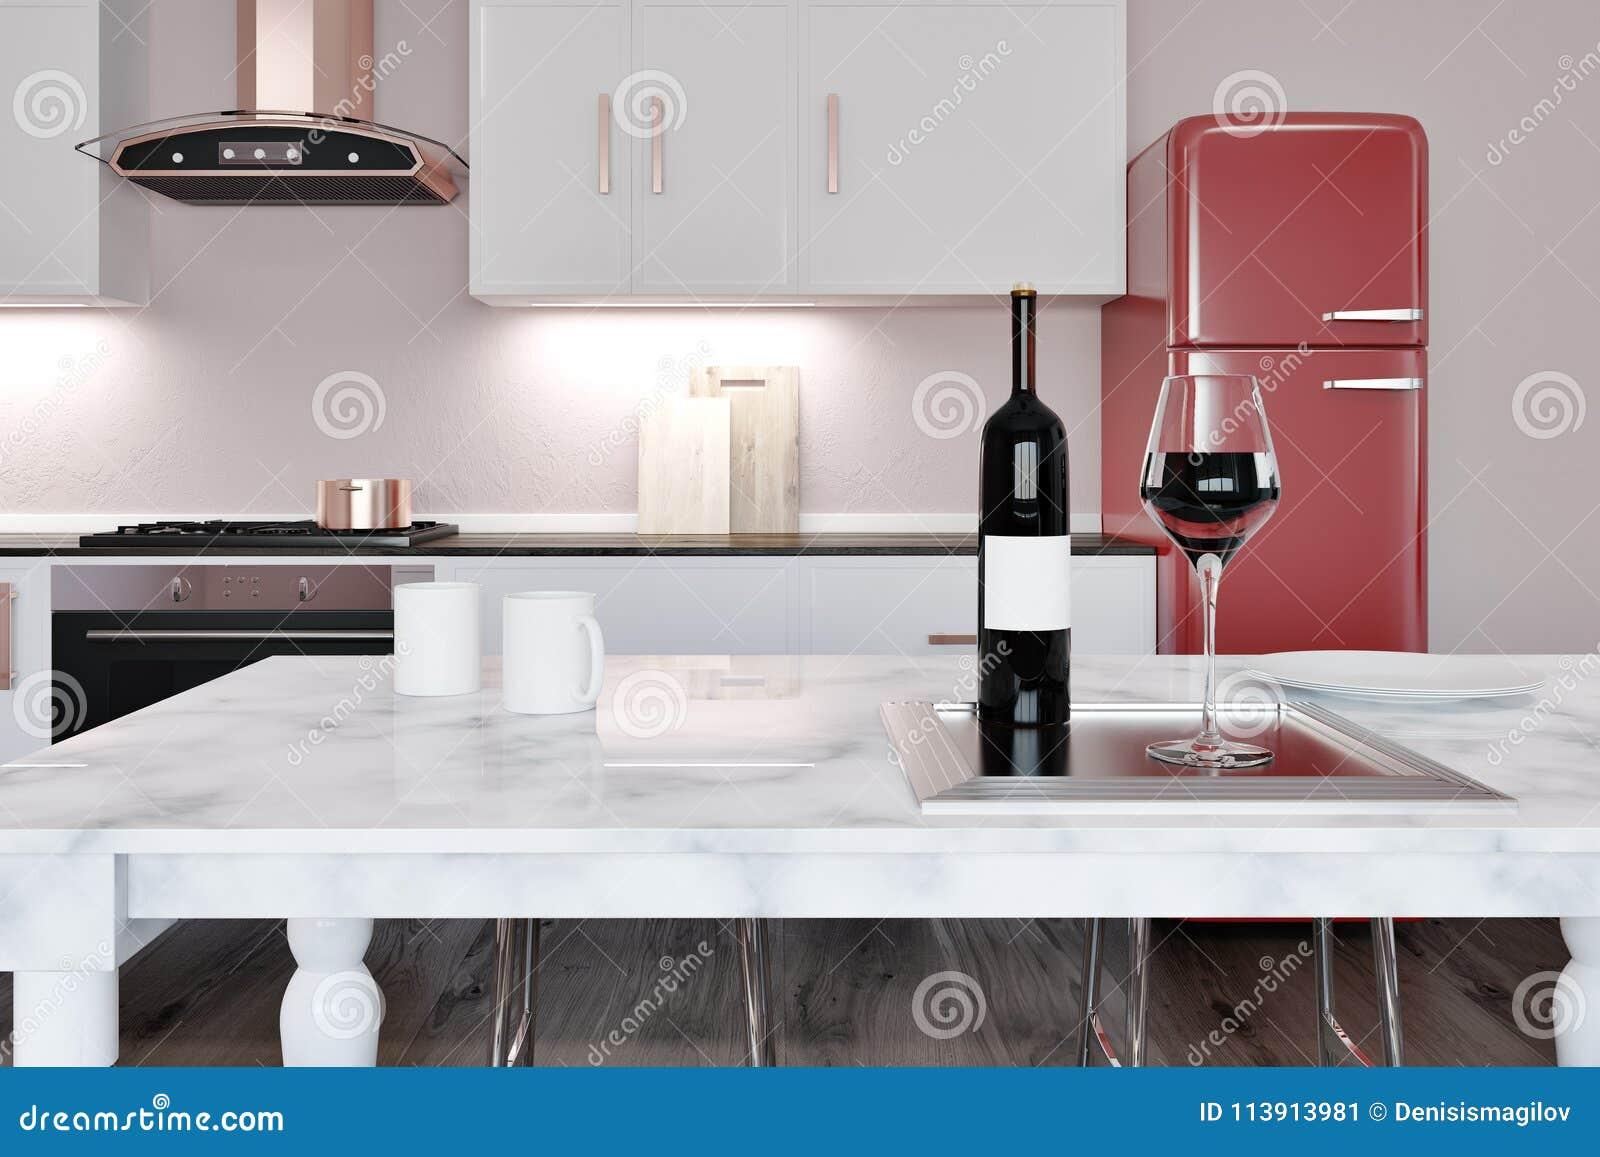 White marble kitchen island red fridge